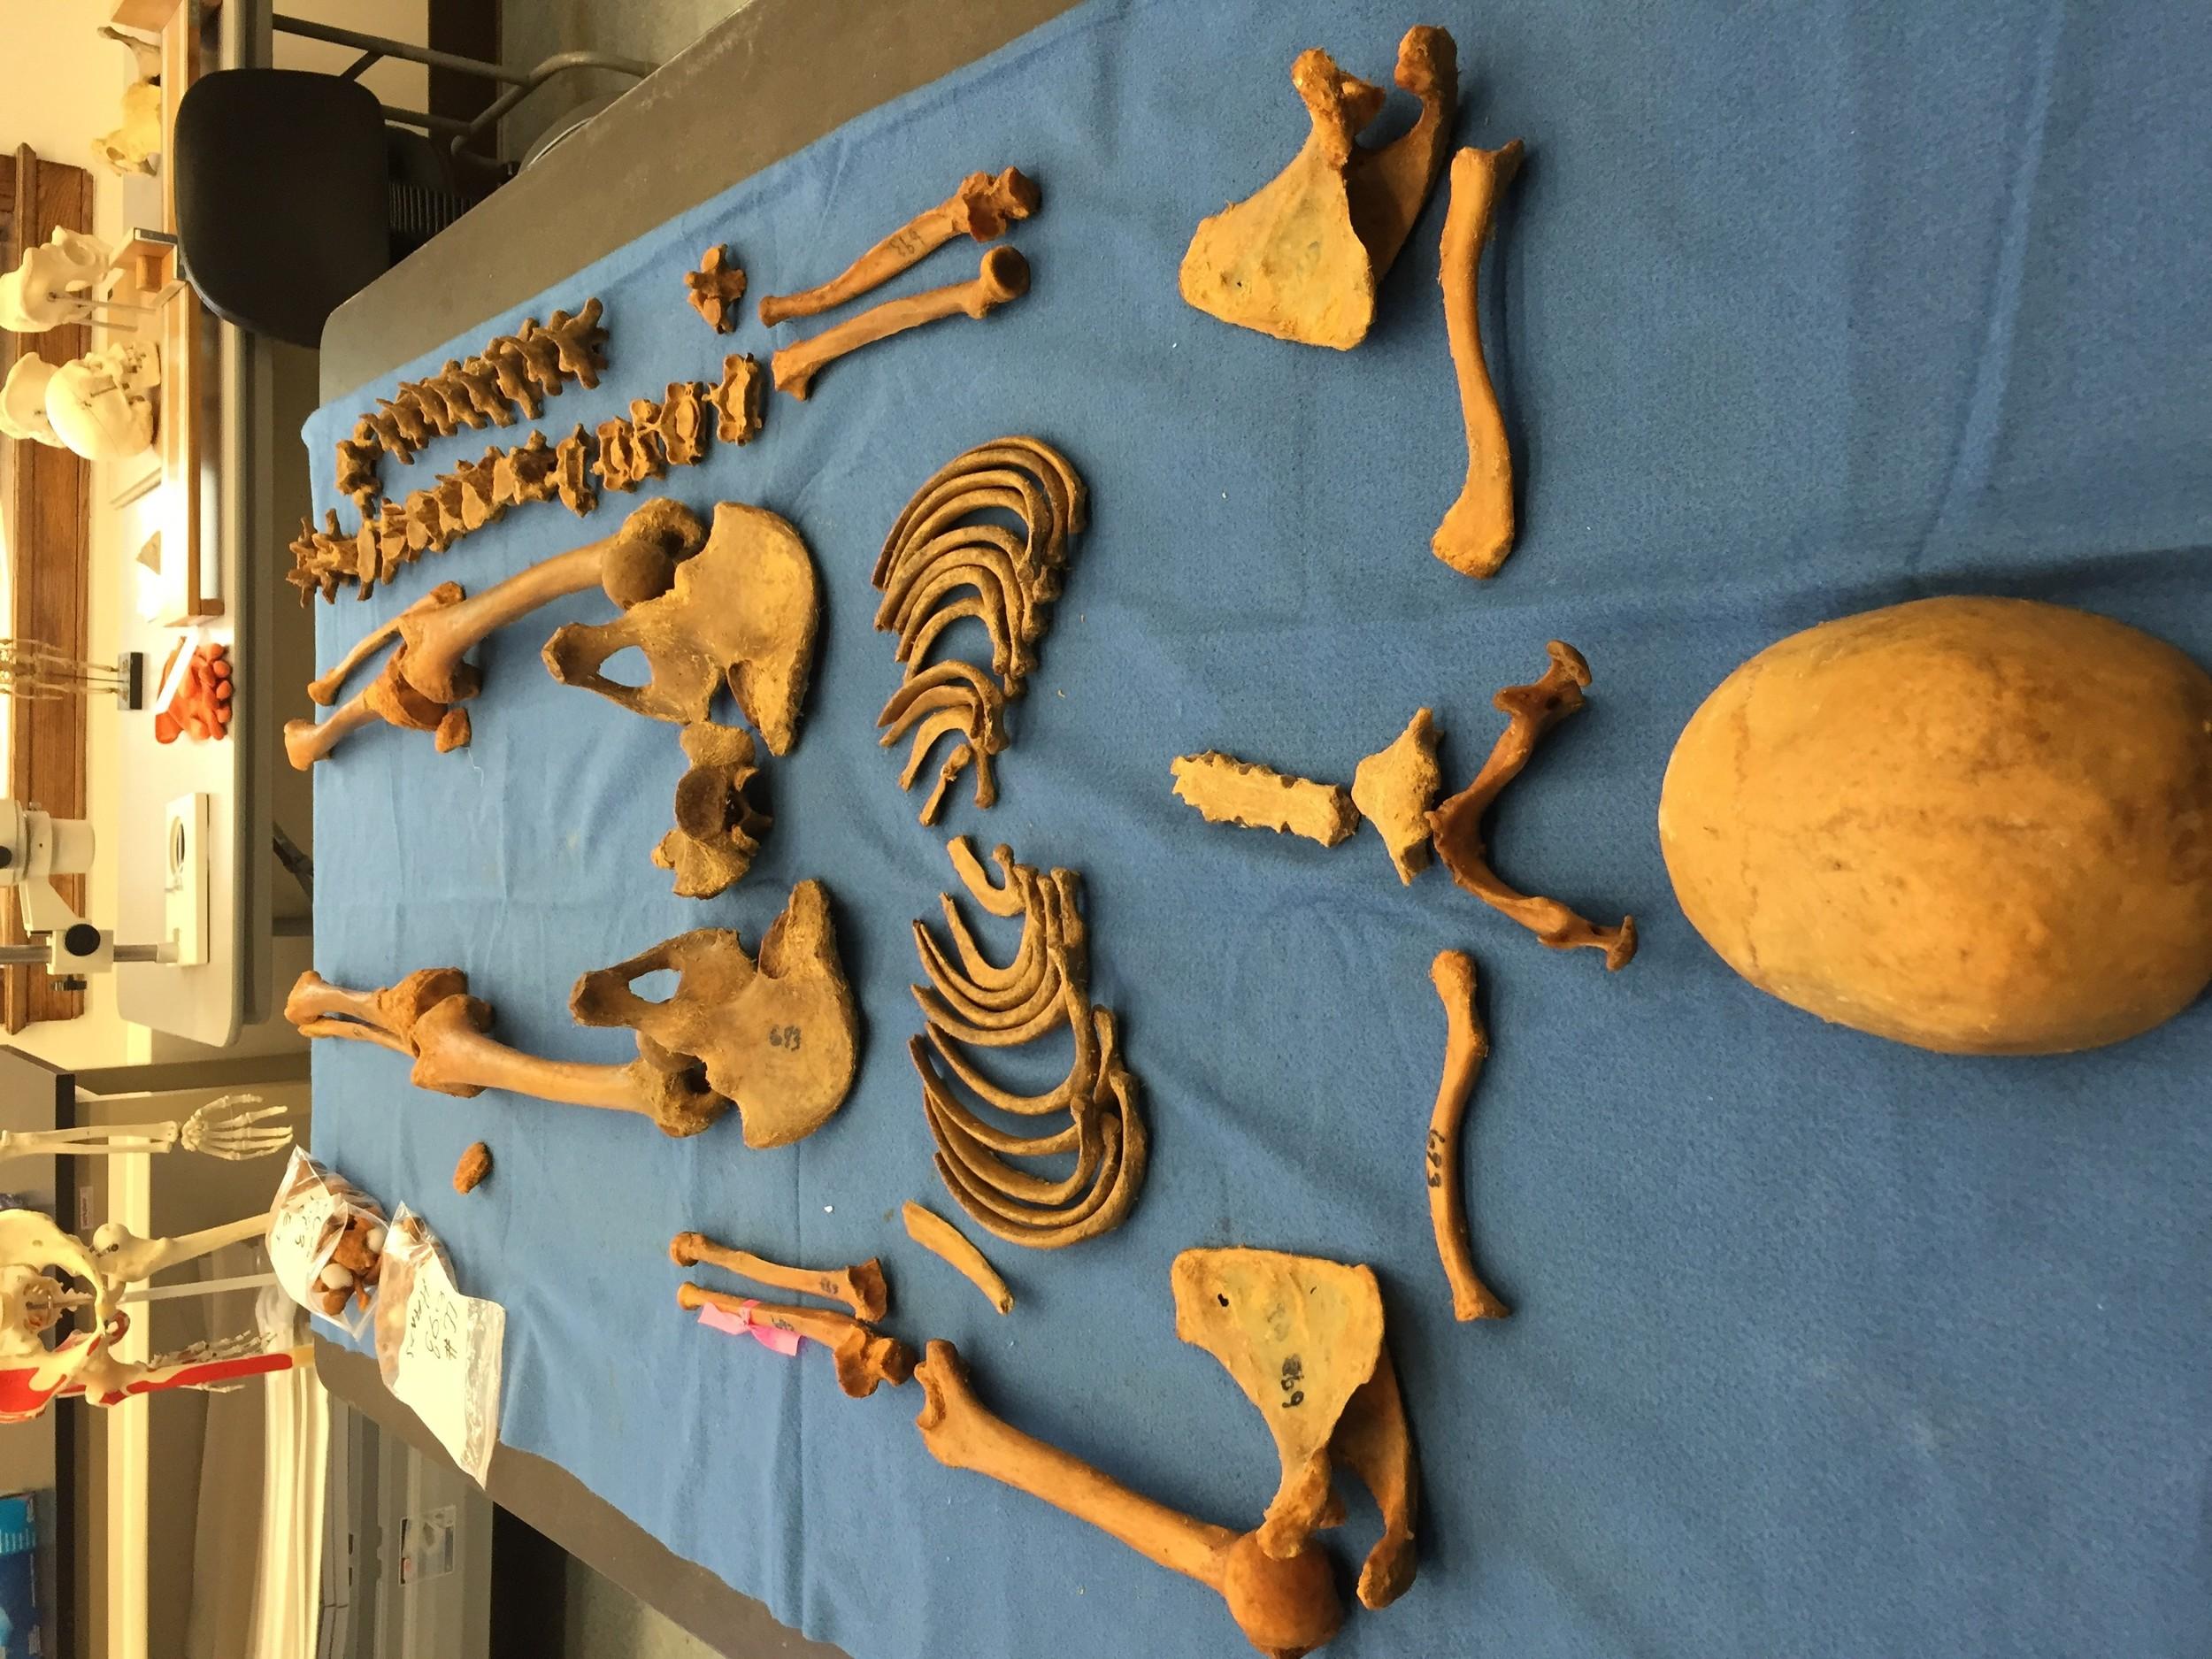 Figure 8: Defleshed Cadaver #693